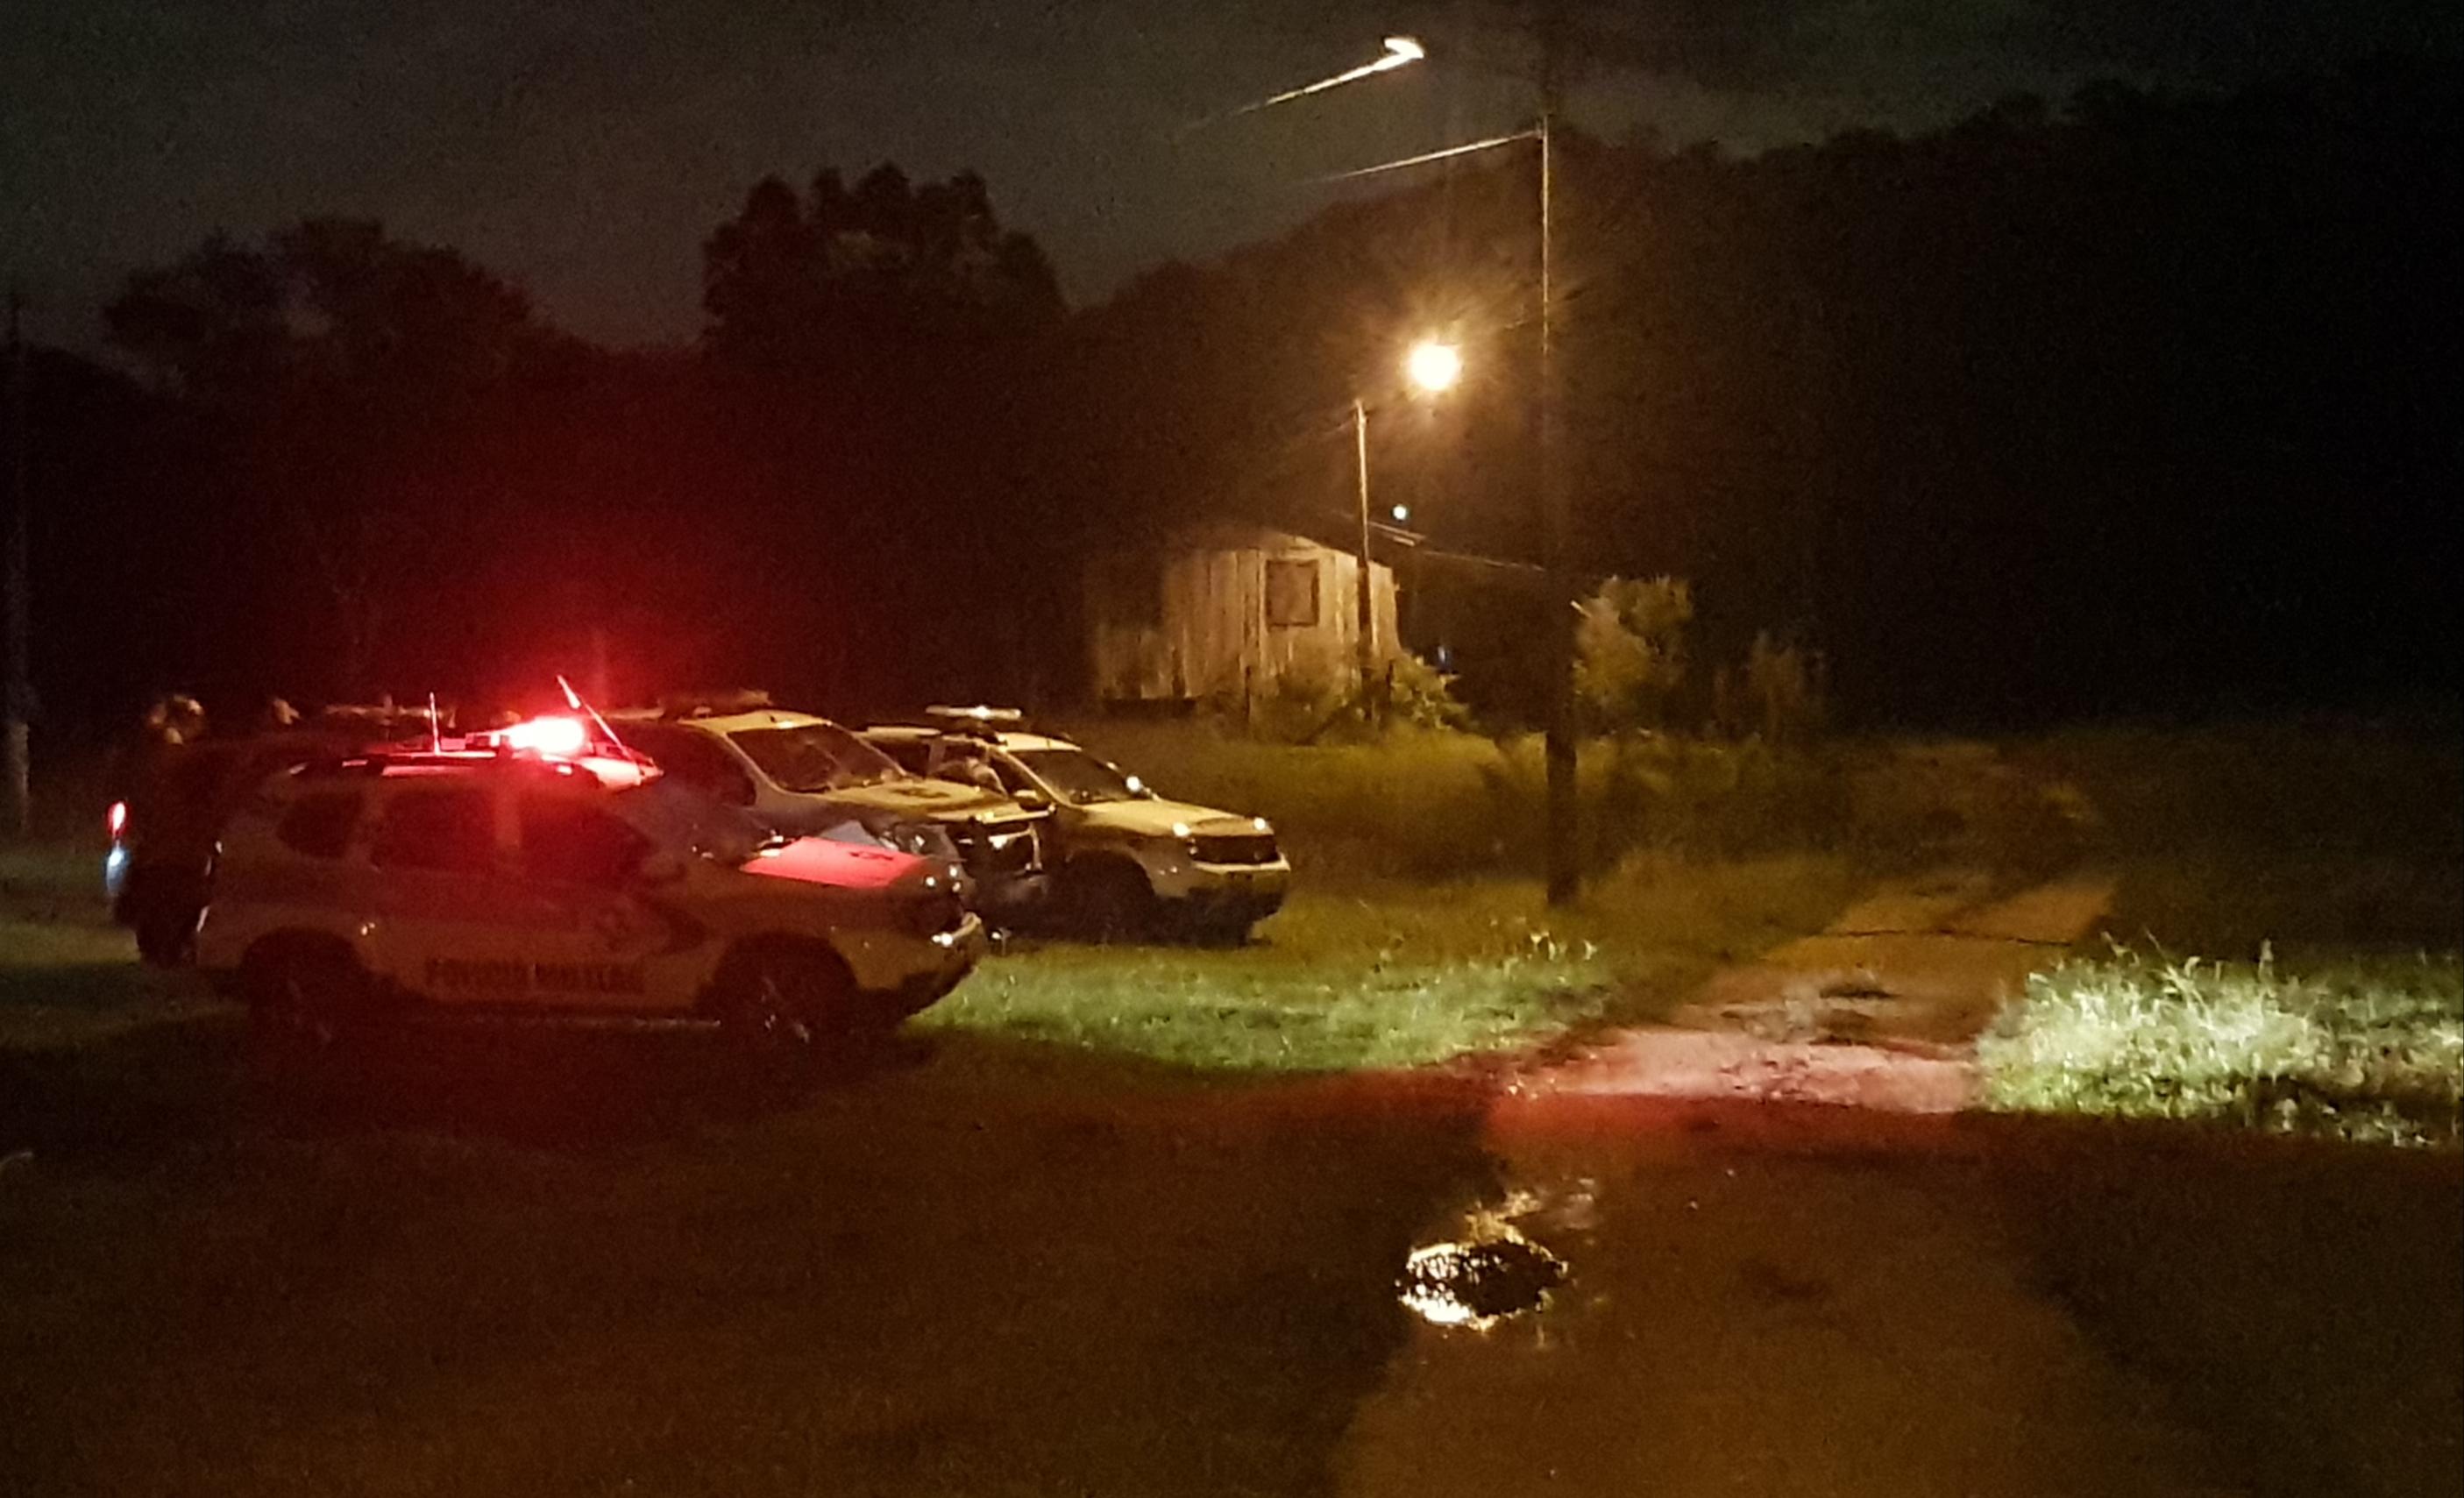 Após bárbaro homicídio, PPT prende bandidos no bairro Jardim Esteves em Criciúma